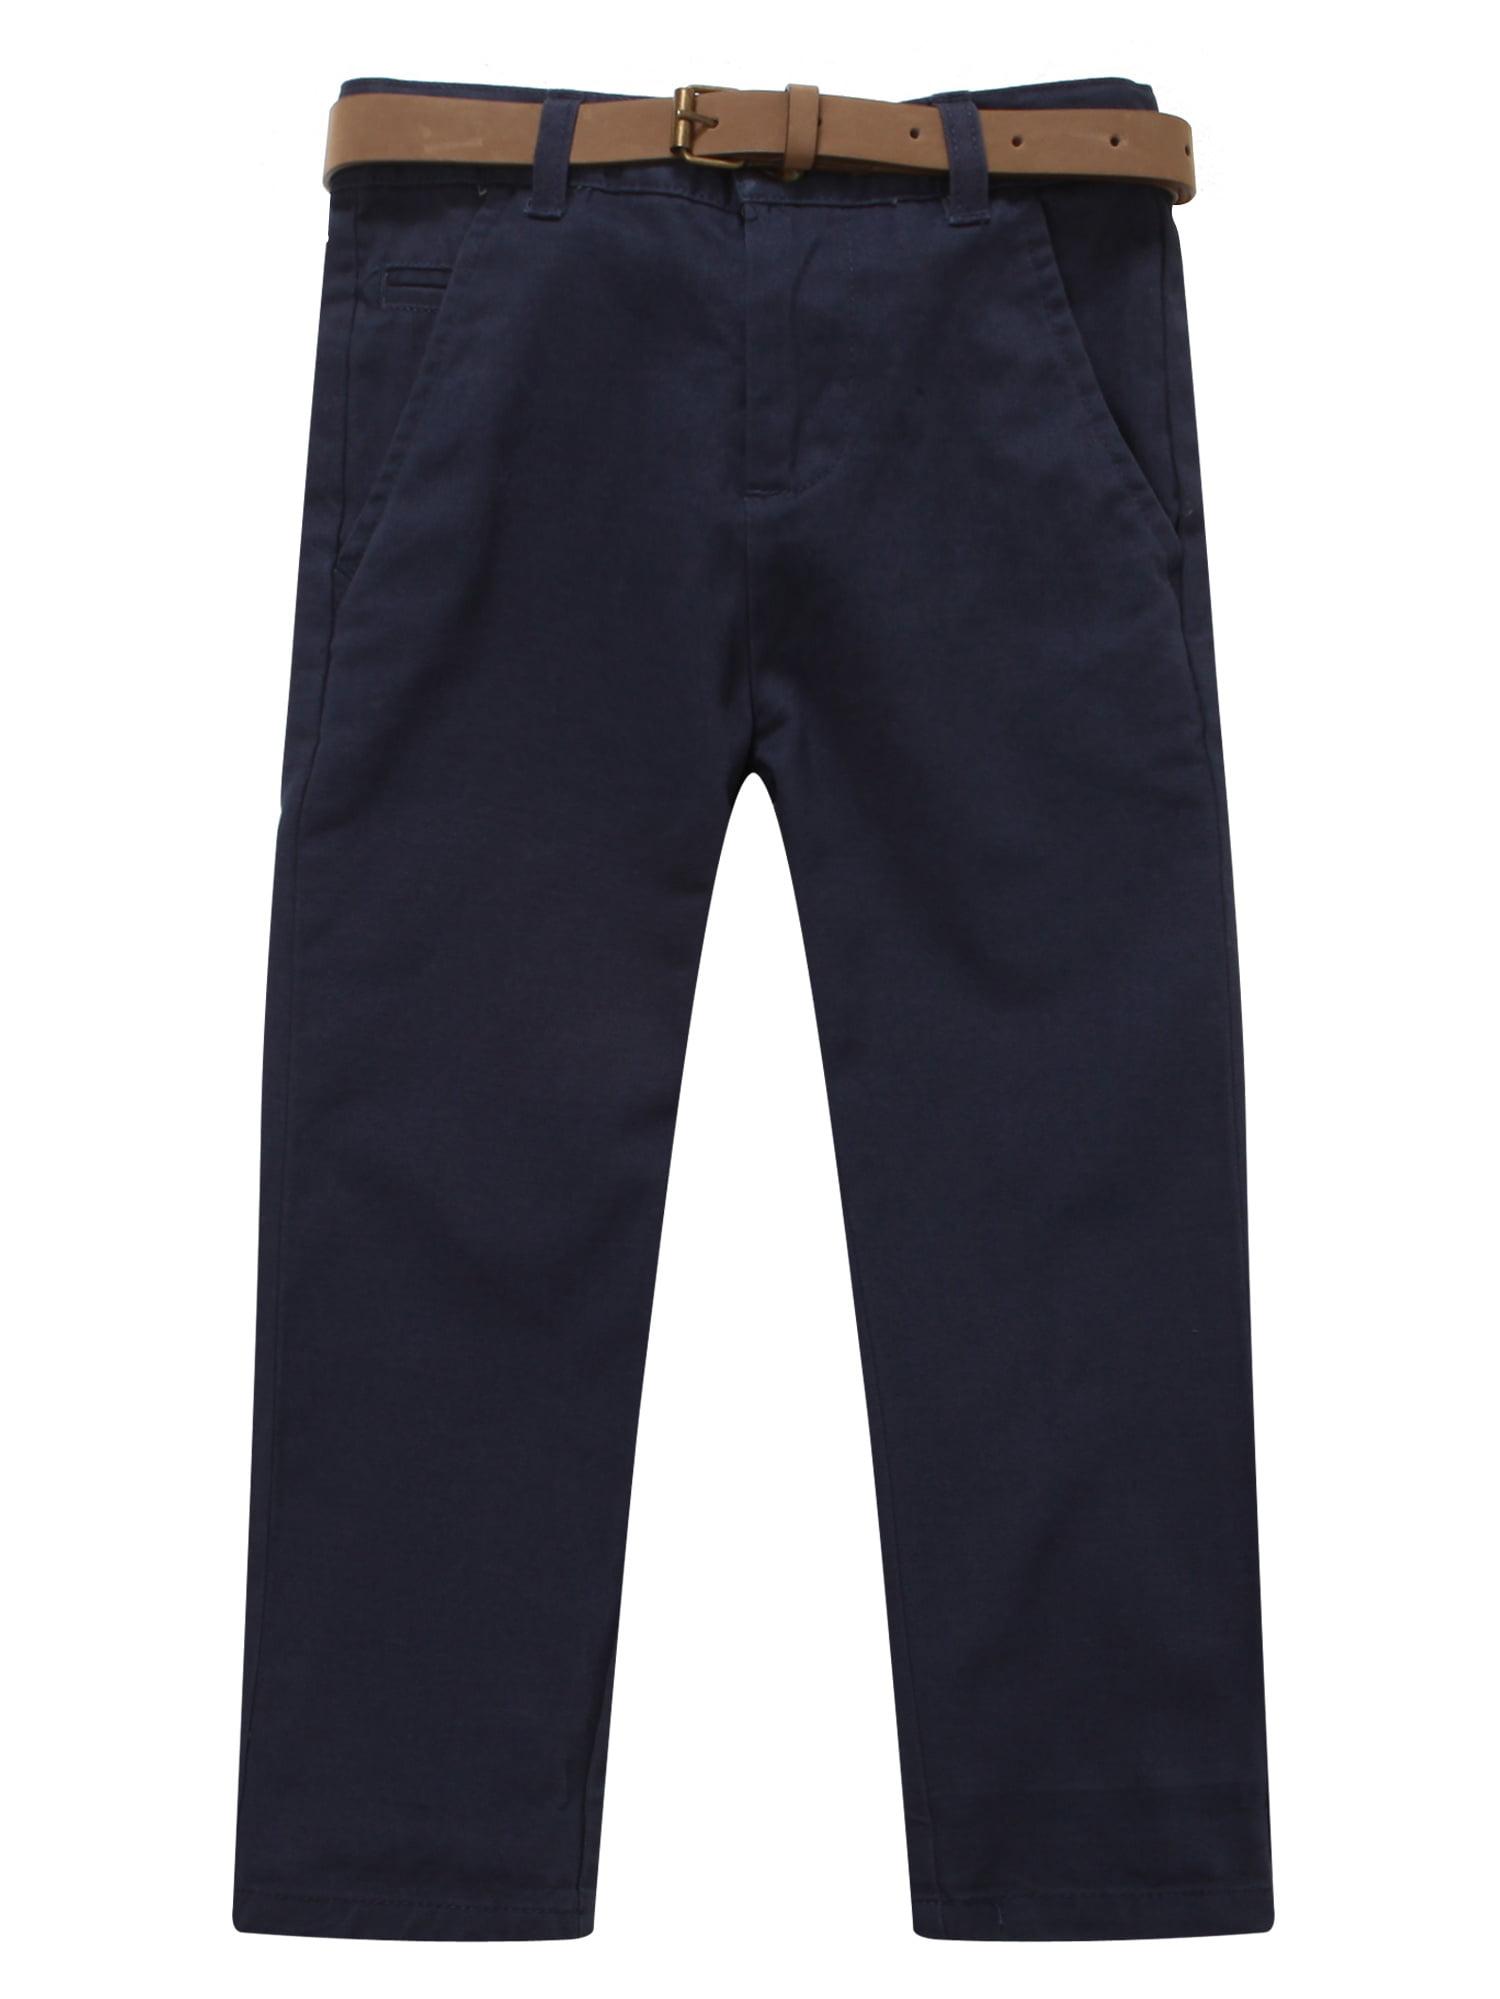 Richie House Girls' Classic Bright Pants RH0744